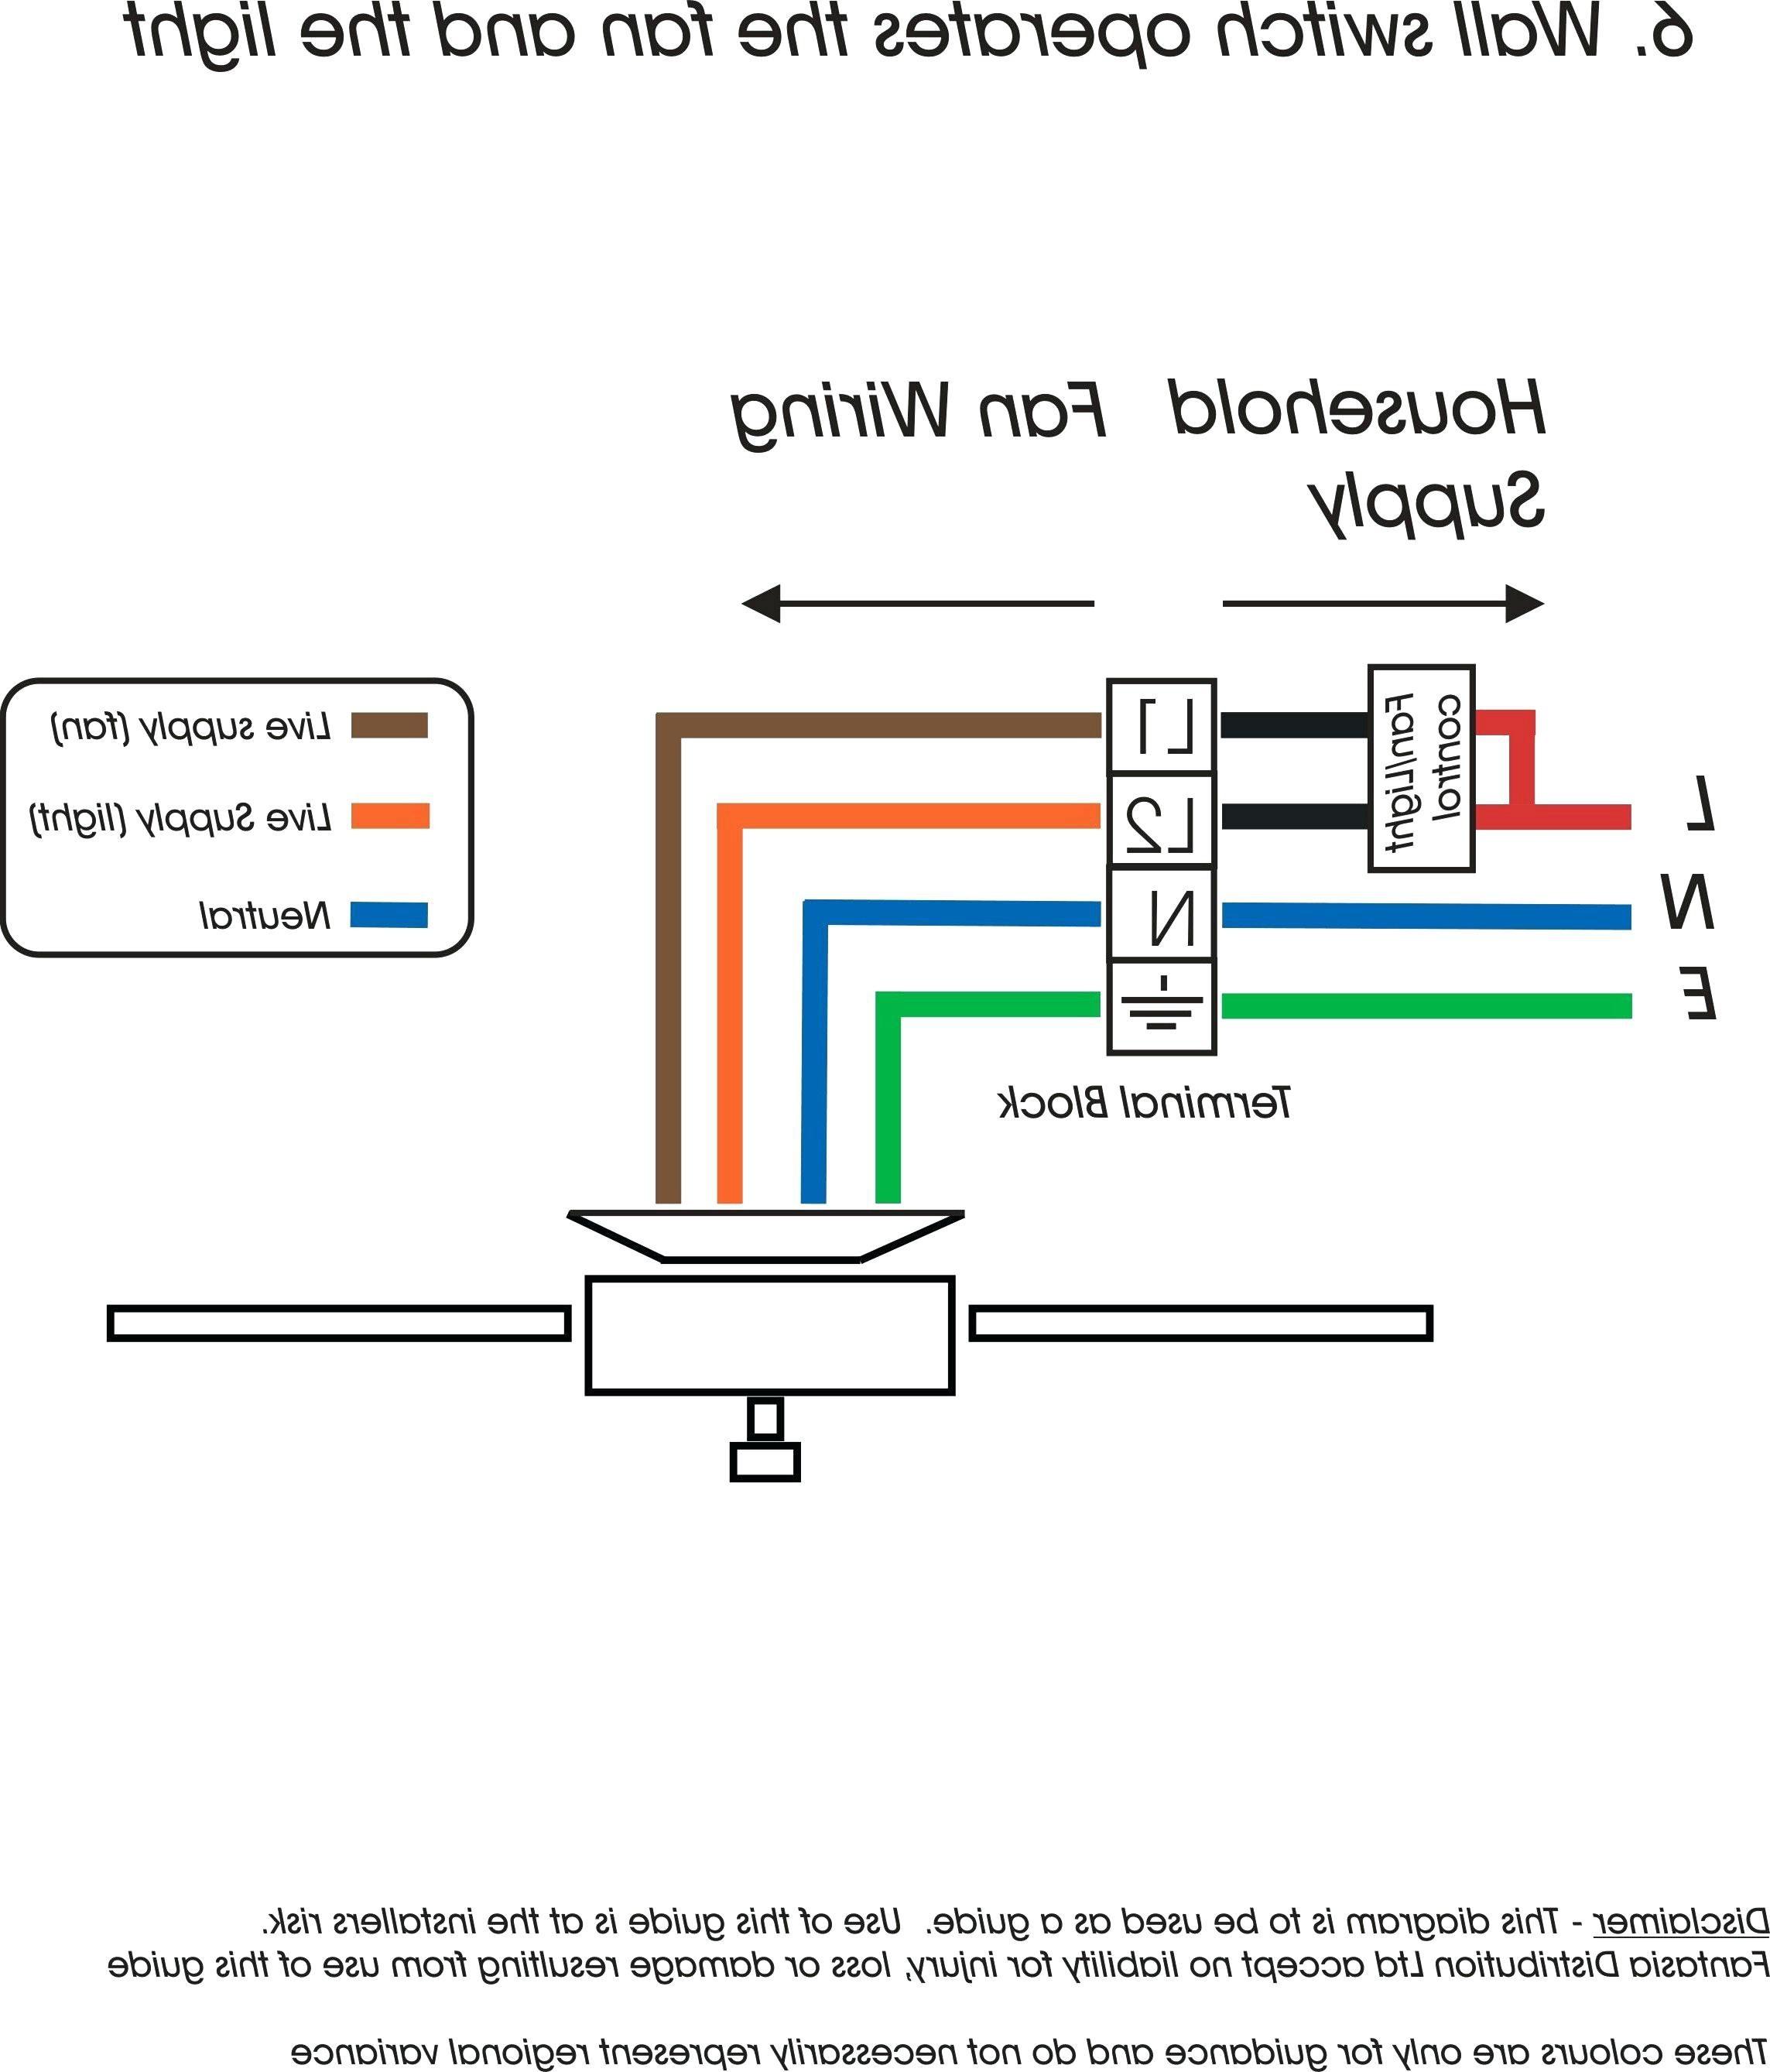 Trailer Light Wiring Diagram Tail Light Wiring Diagram Fresh Wiring Diagram for Bathroom Fan and Of Trailer Light Wiring Diagram